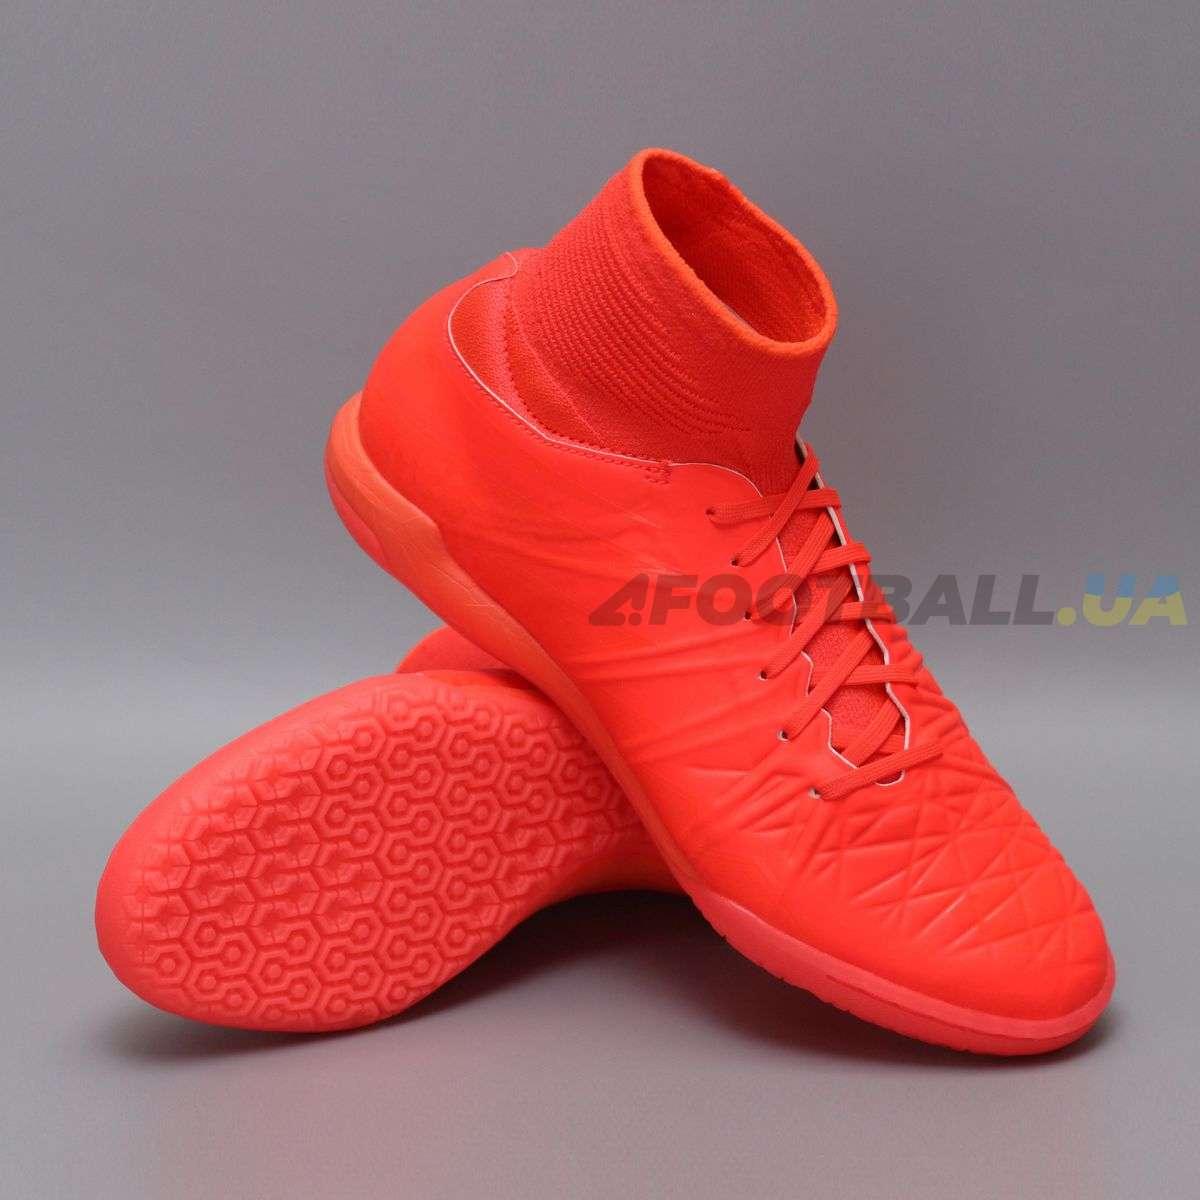 Детские футзалки Nike JR HYPERVENOMX PROXIMO IC - Total Orange  f2b67f00adb3c